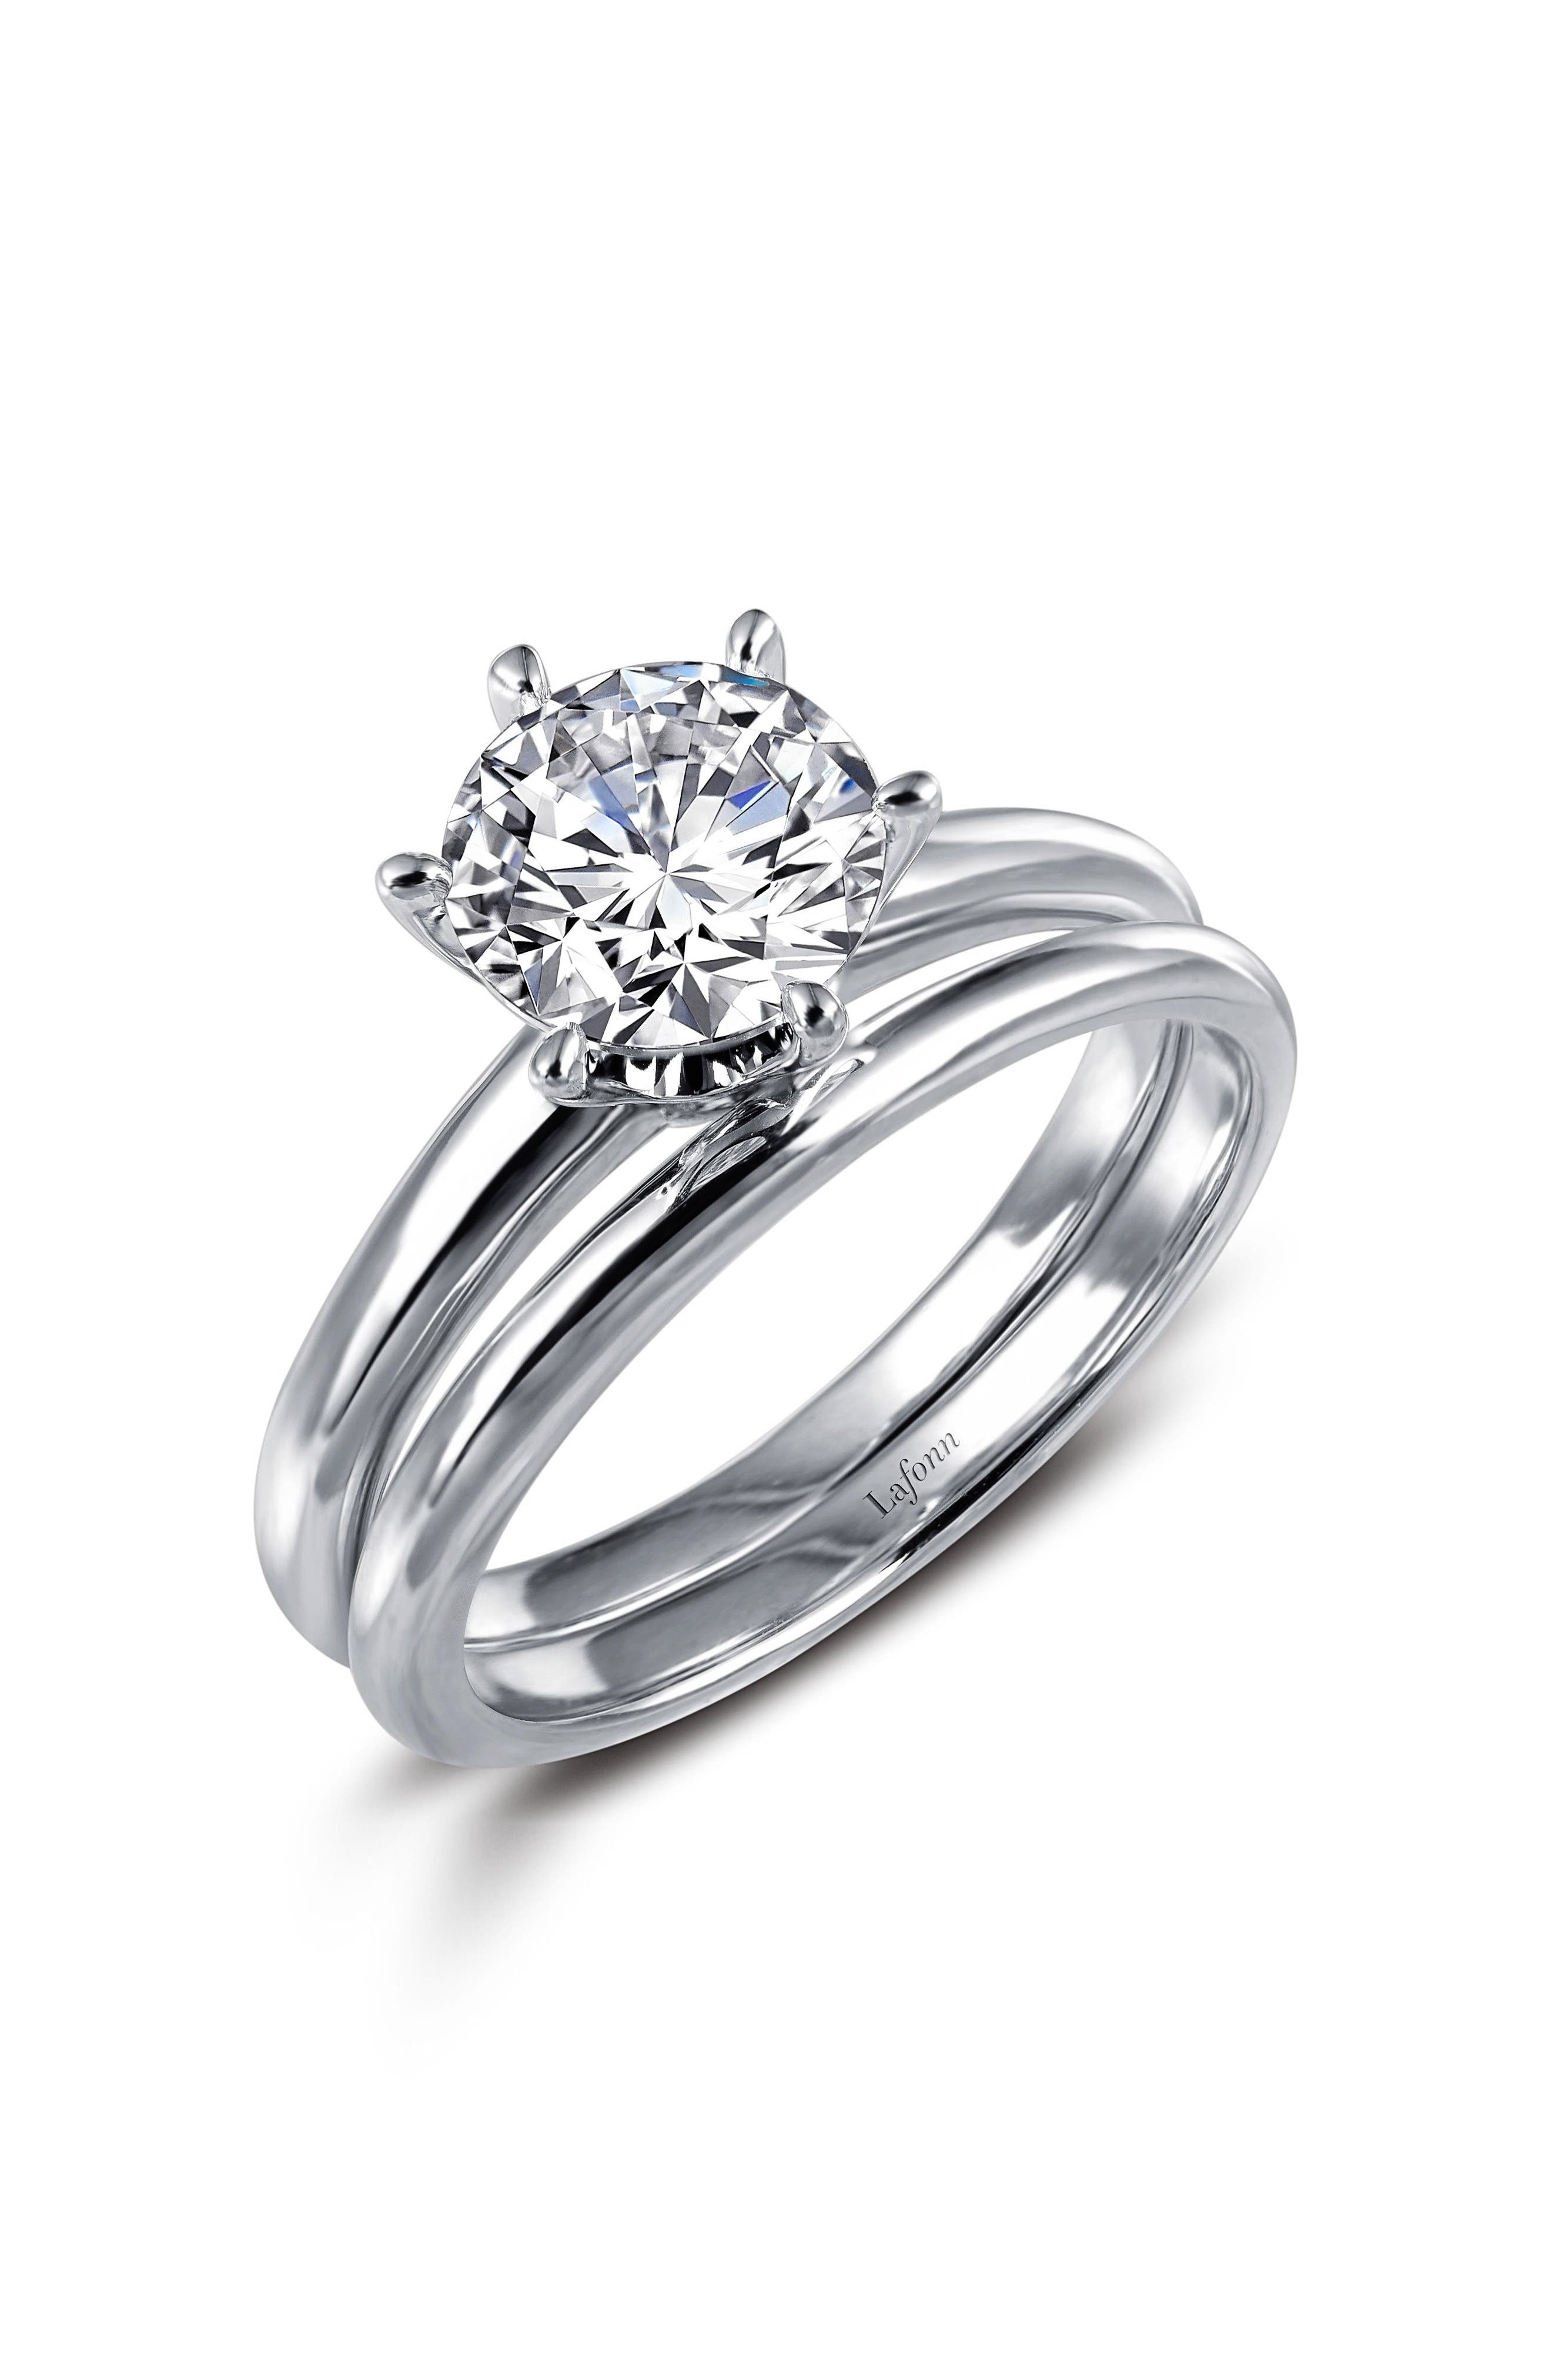 Simulated Diamond Ring